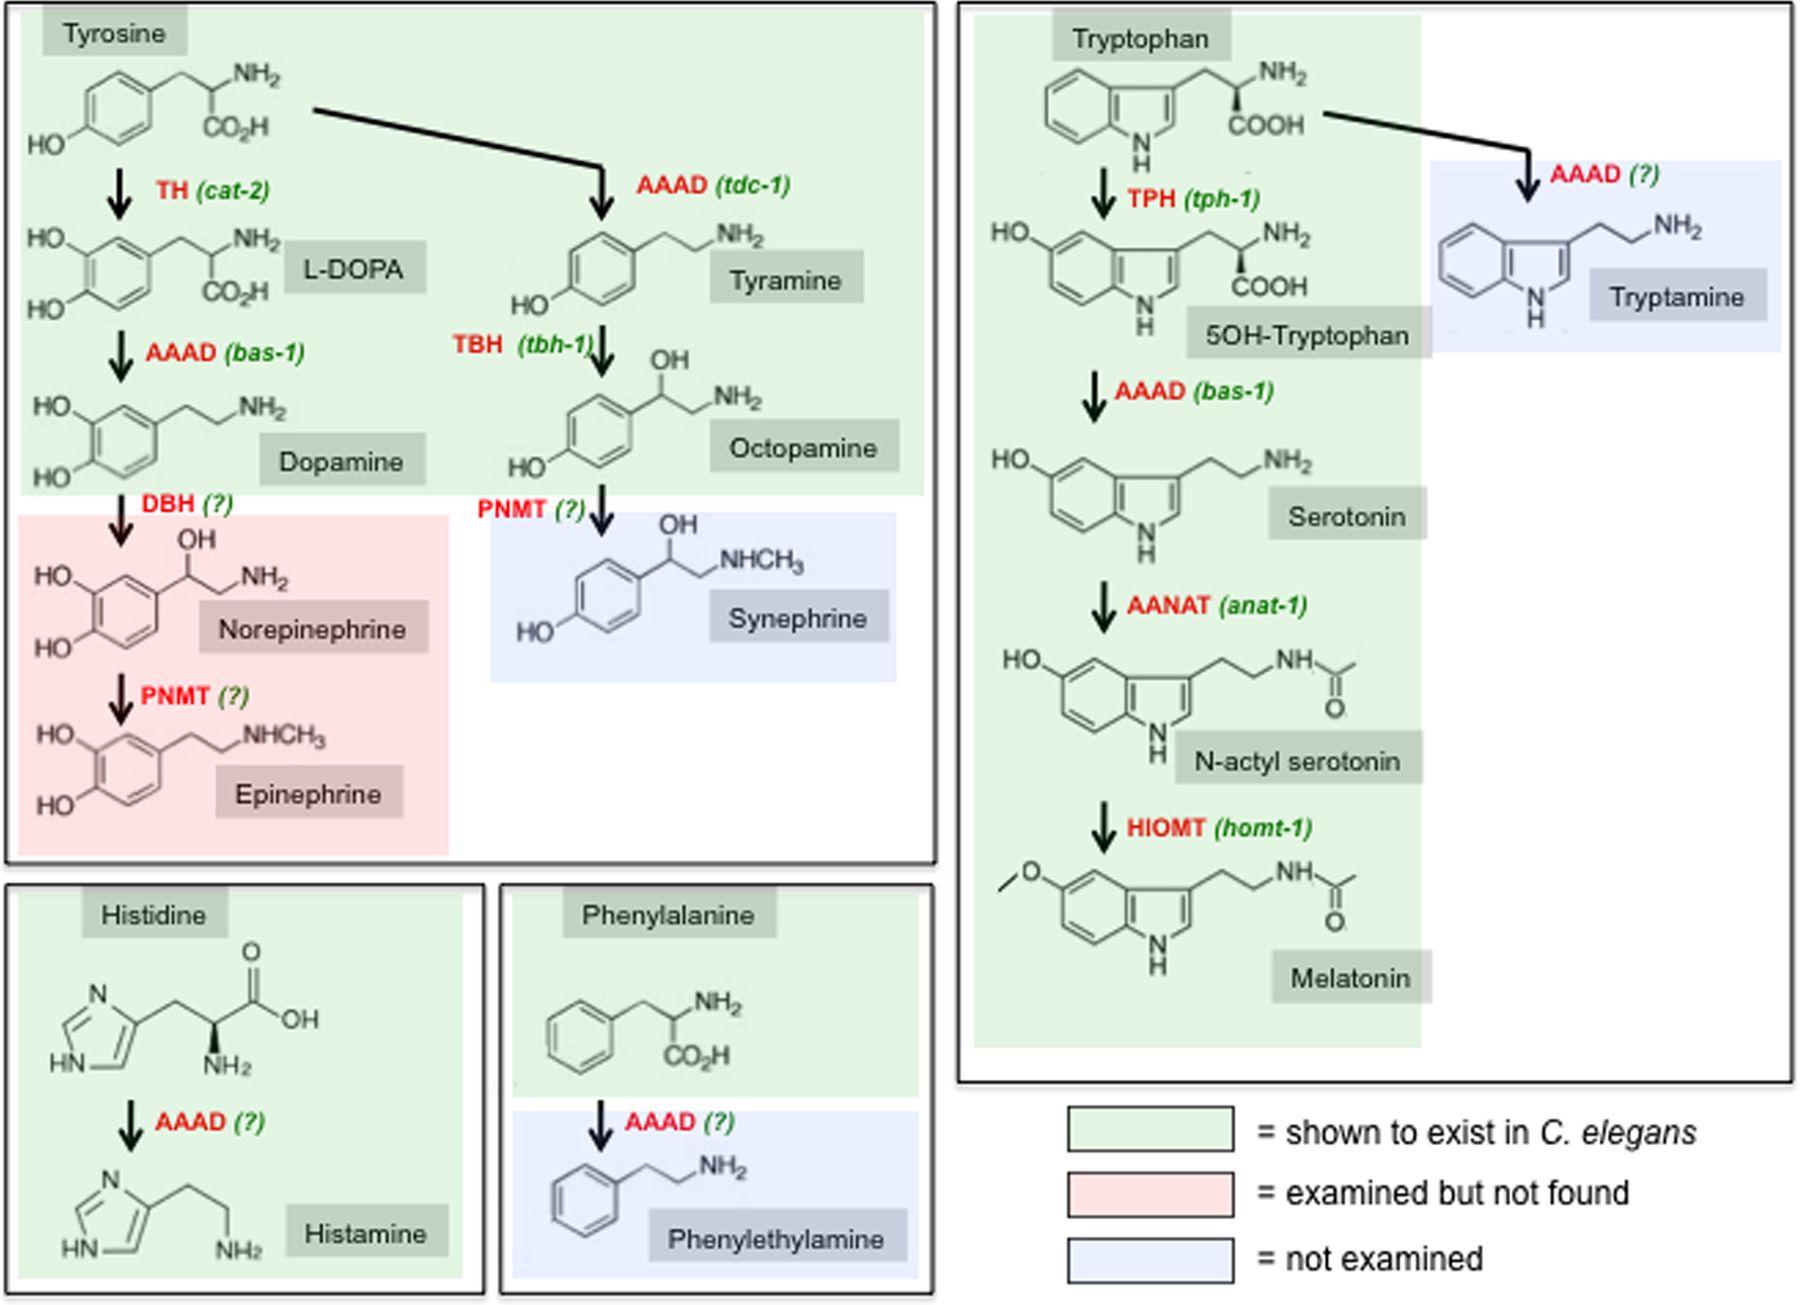 Acetylcholine Choline Dopamine Norepinephrine Epinephrine